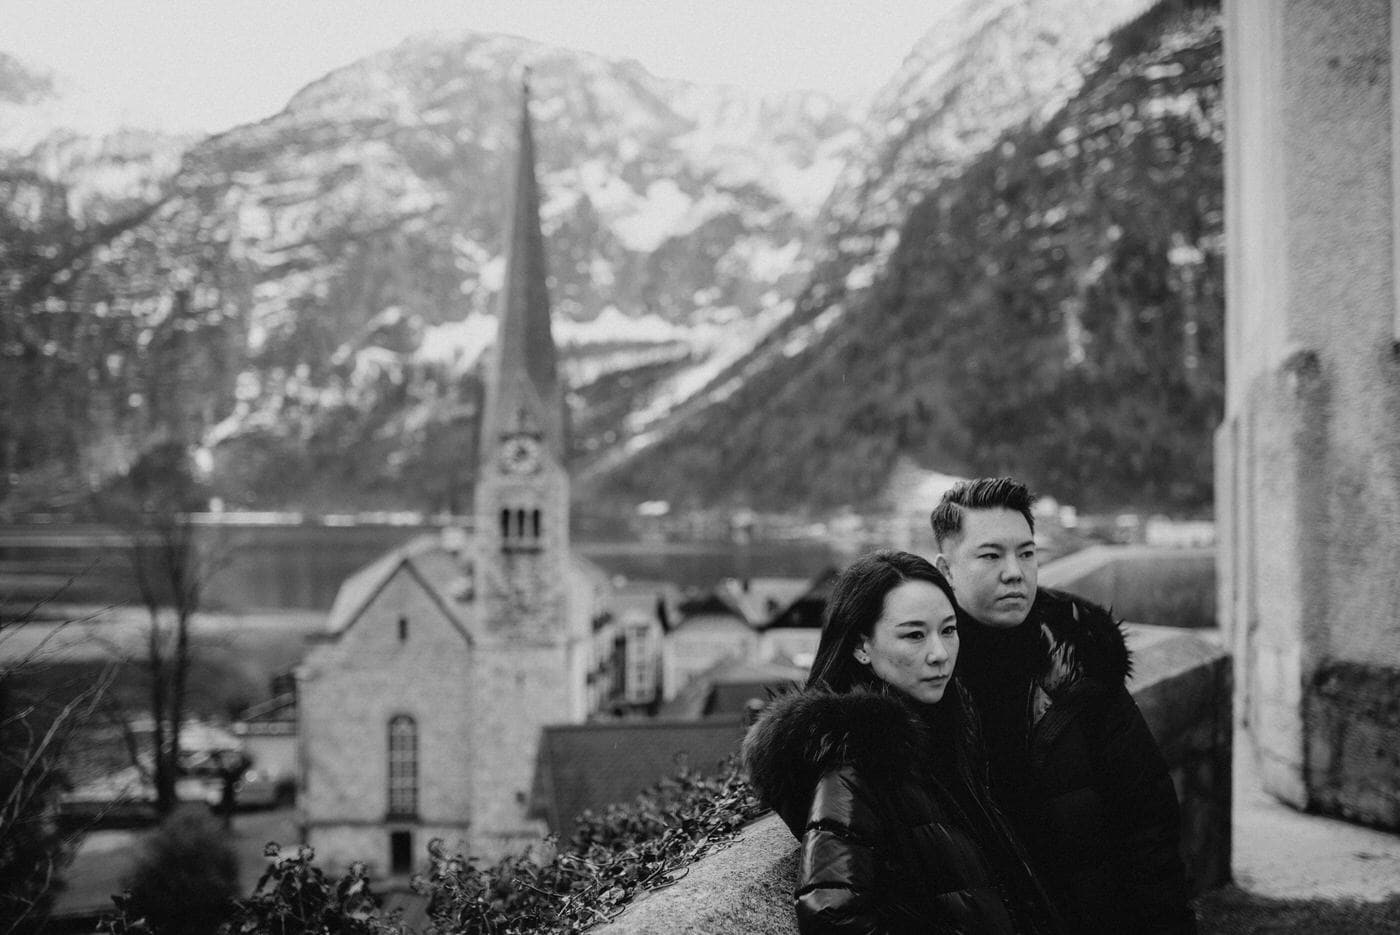 pre wedding hallstatt engagement photographer austria 047 - Hallstatt Engagement Session & Secret Proposal